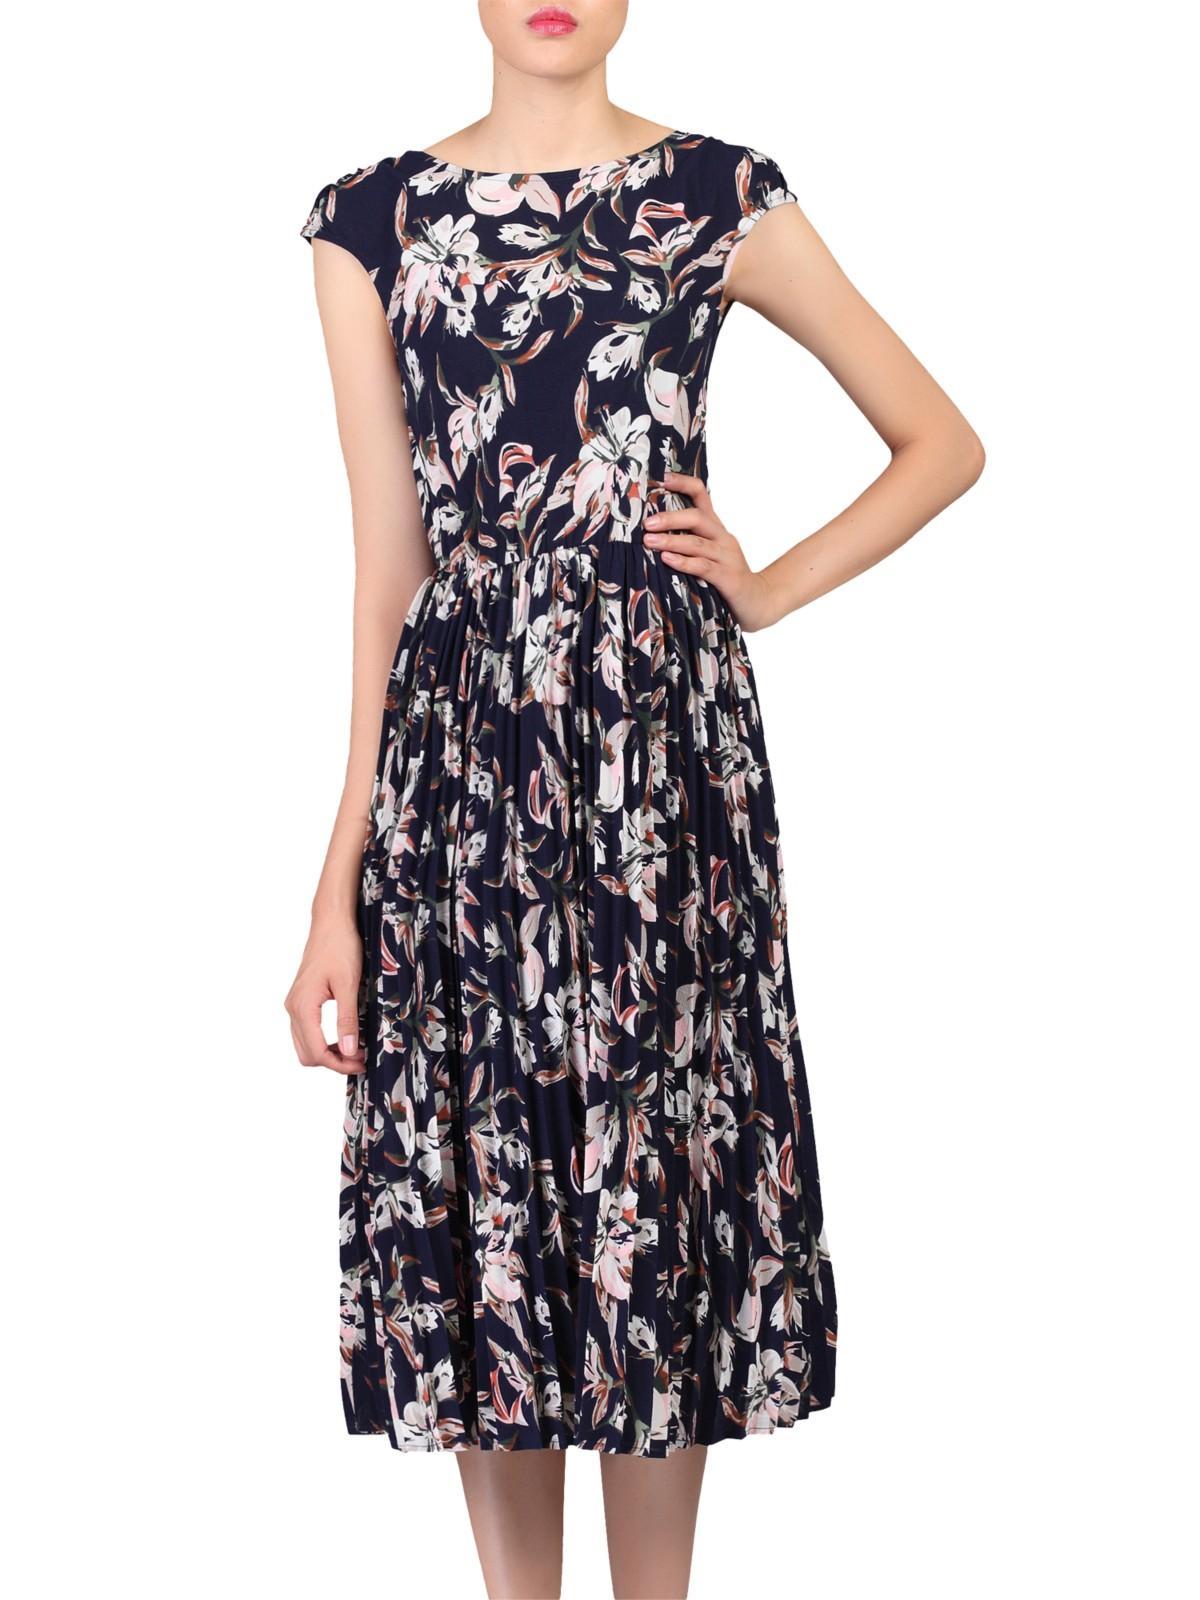 Jolie Moi Satin Floral Print Pleated Tea Dress in Blue